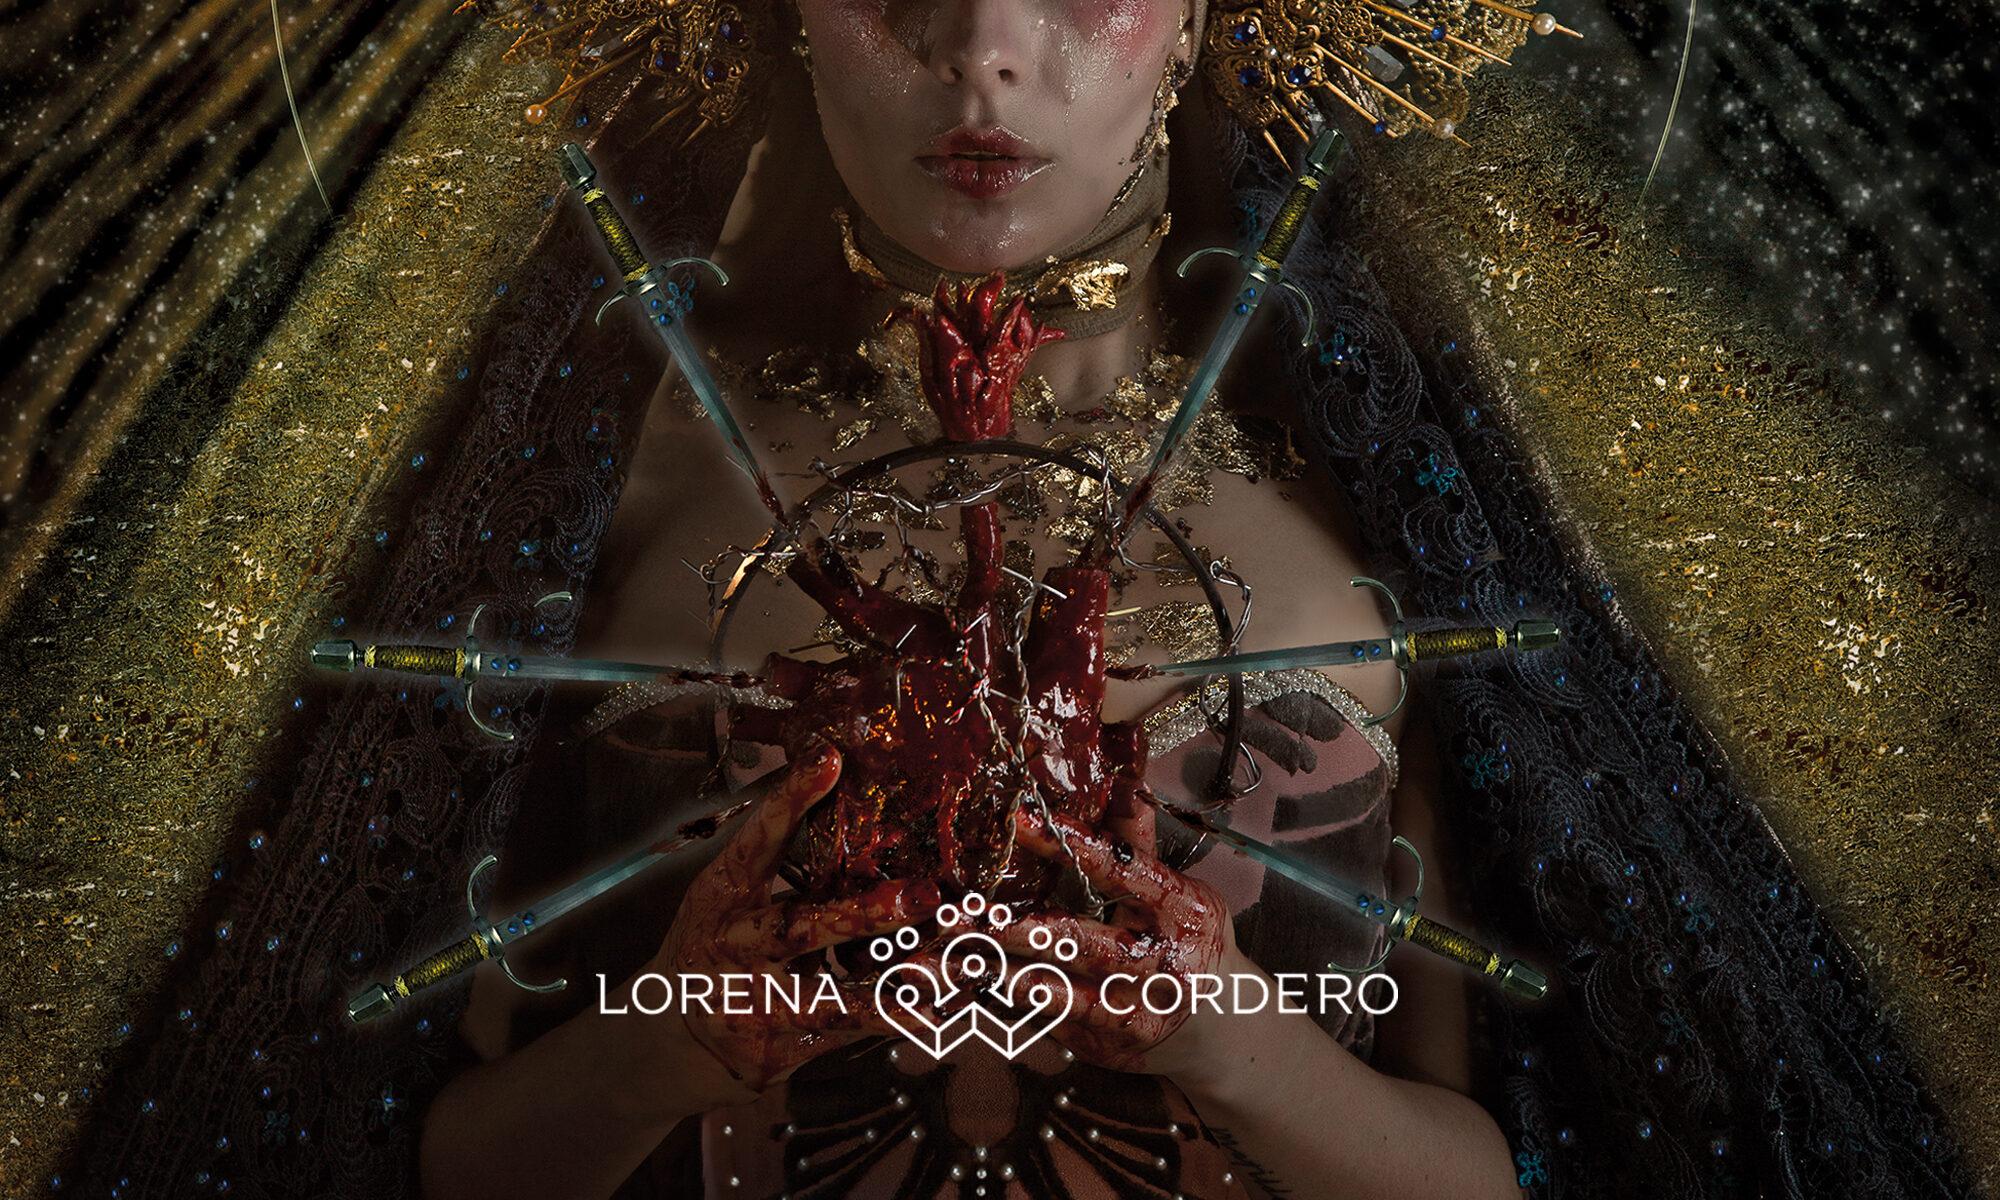 Lorena Cordero